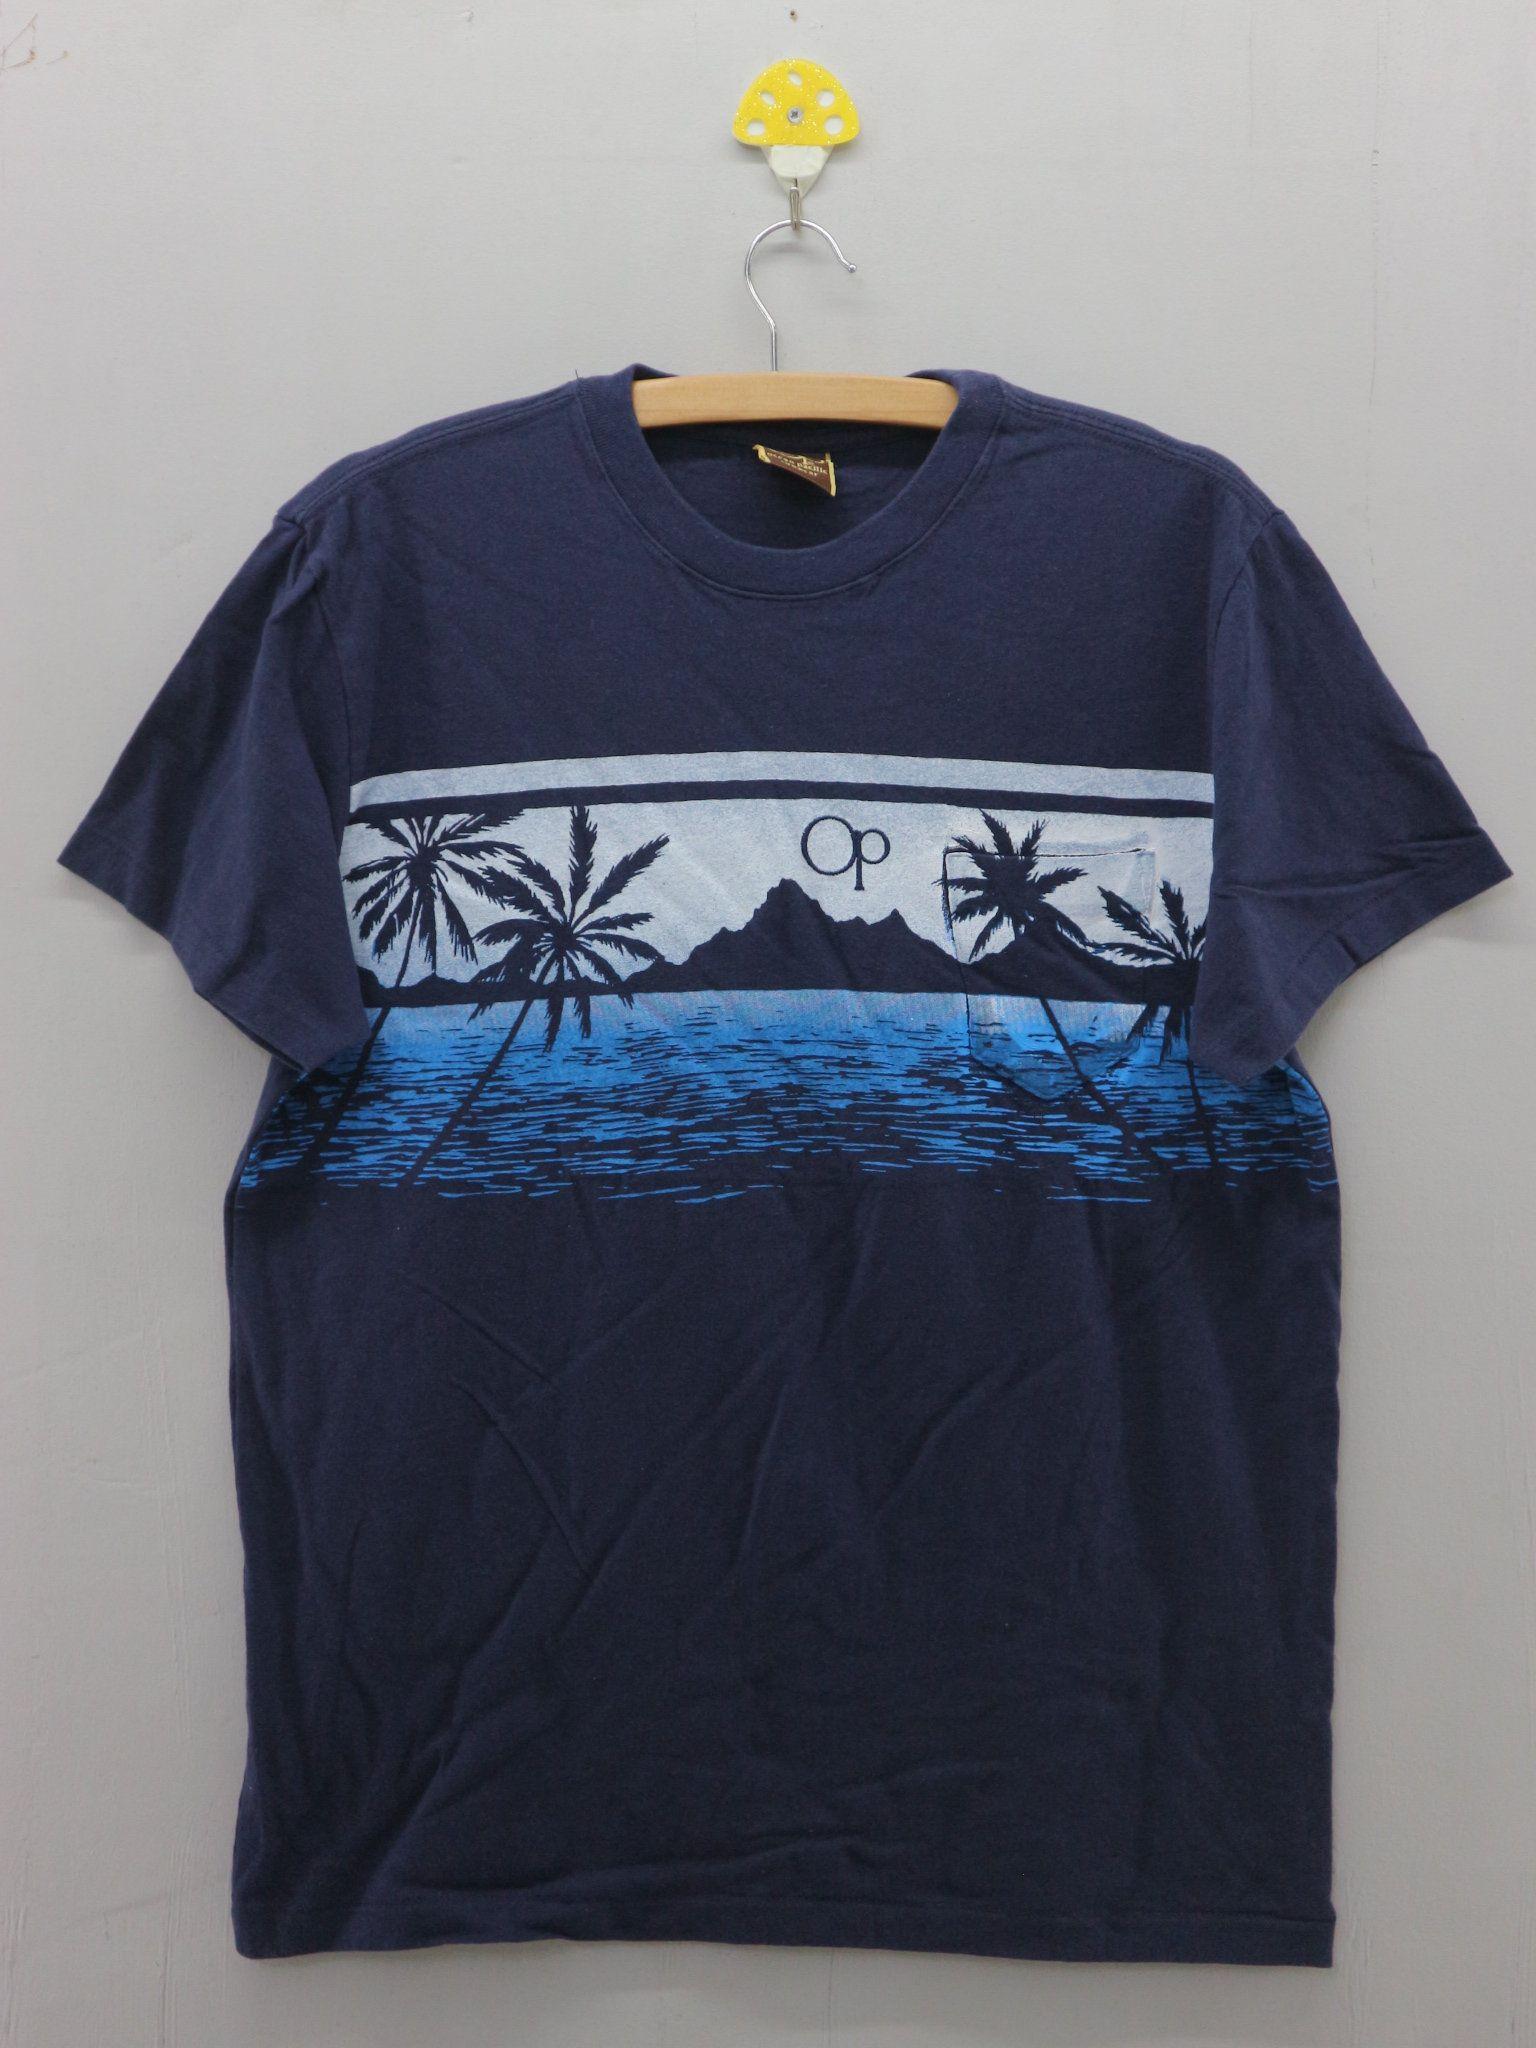 1823d76c00a50 Vintage Ocean Pacific Sunwear Big Logo T Shirt Sport Surf Aloha Hawaii Top  Tees Size M | Vintage Surf / OP Ocean Pacific | Tops, T shirt, Aloha hawaii